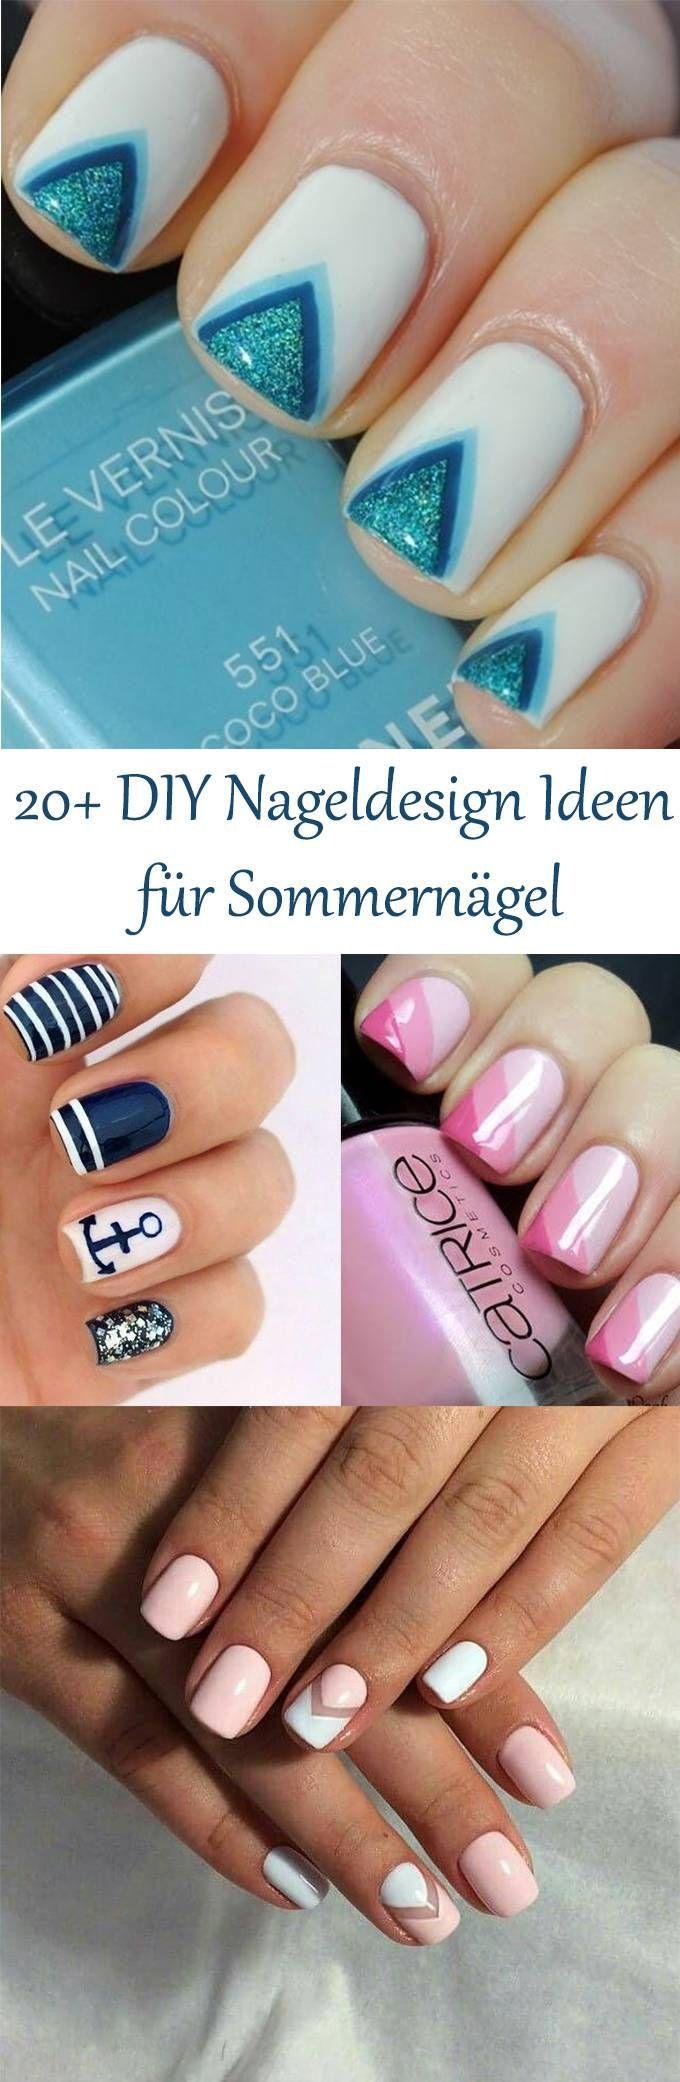 20+ DIY Nail Design Ideen für verträumte Sommernägel – Der Sommer kann kommen – Nail Art – Nagel